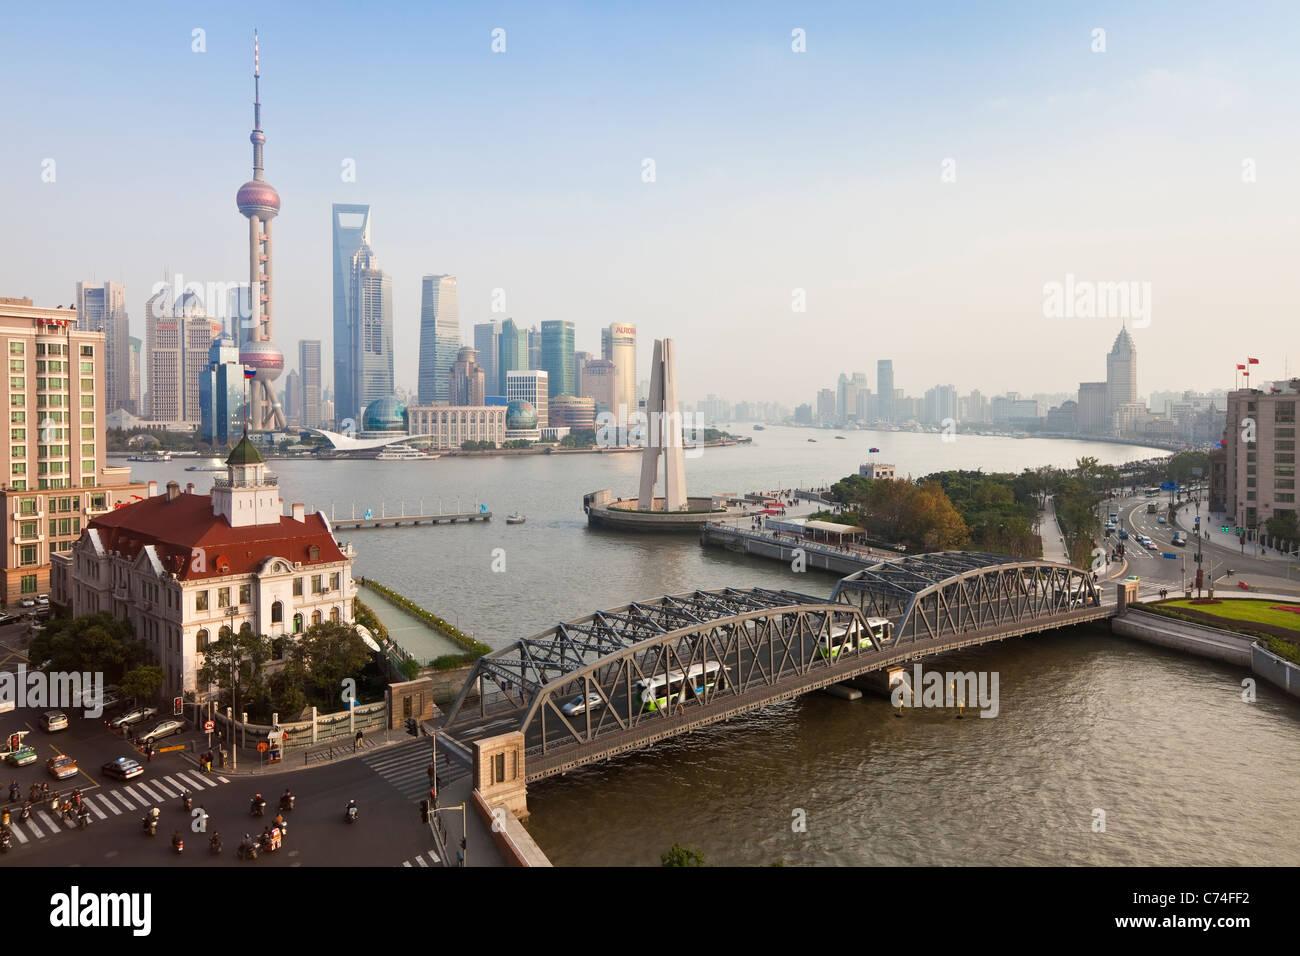 New Pudong skyline Waibaidu (Garden) Bridge looking across the Huangpu River from the Bund Shanghai China - Stock Image